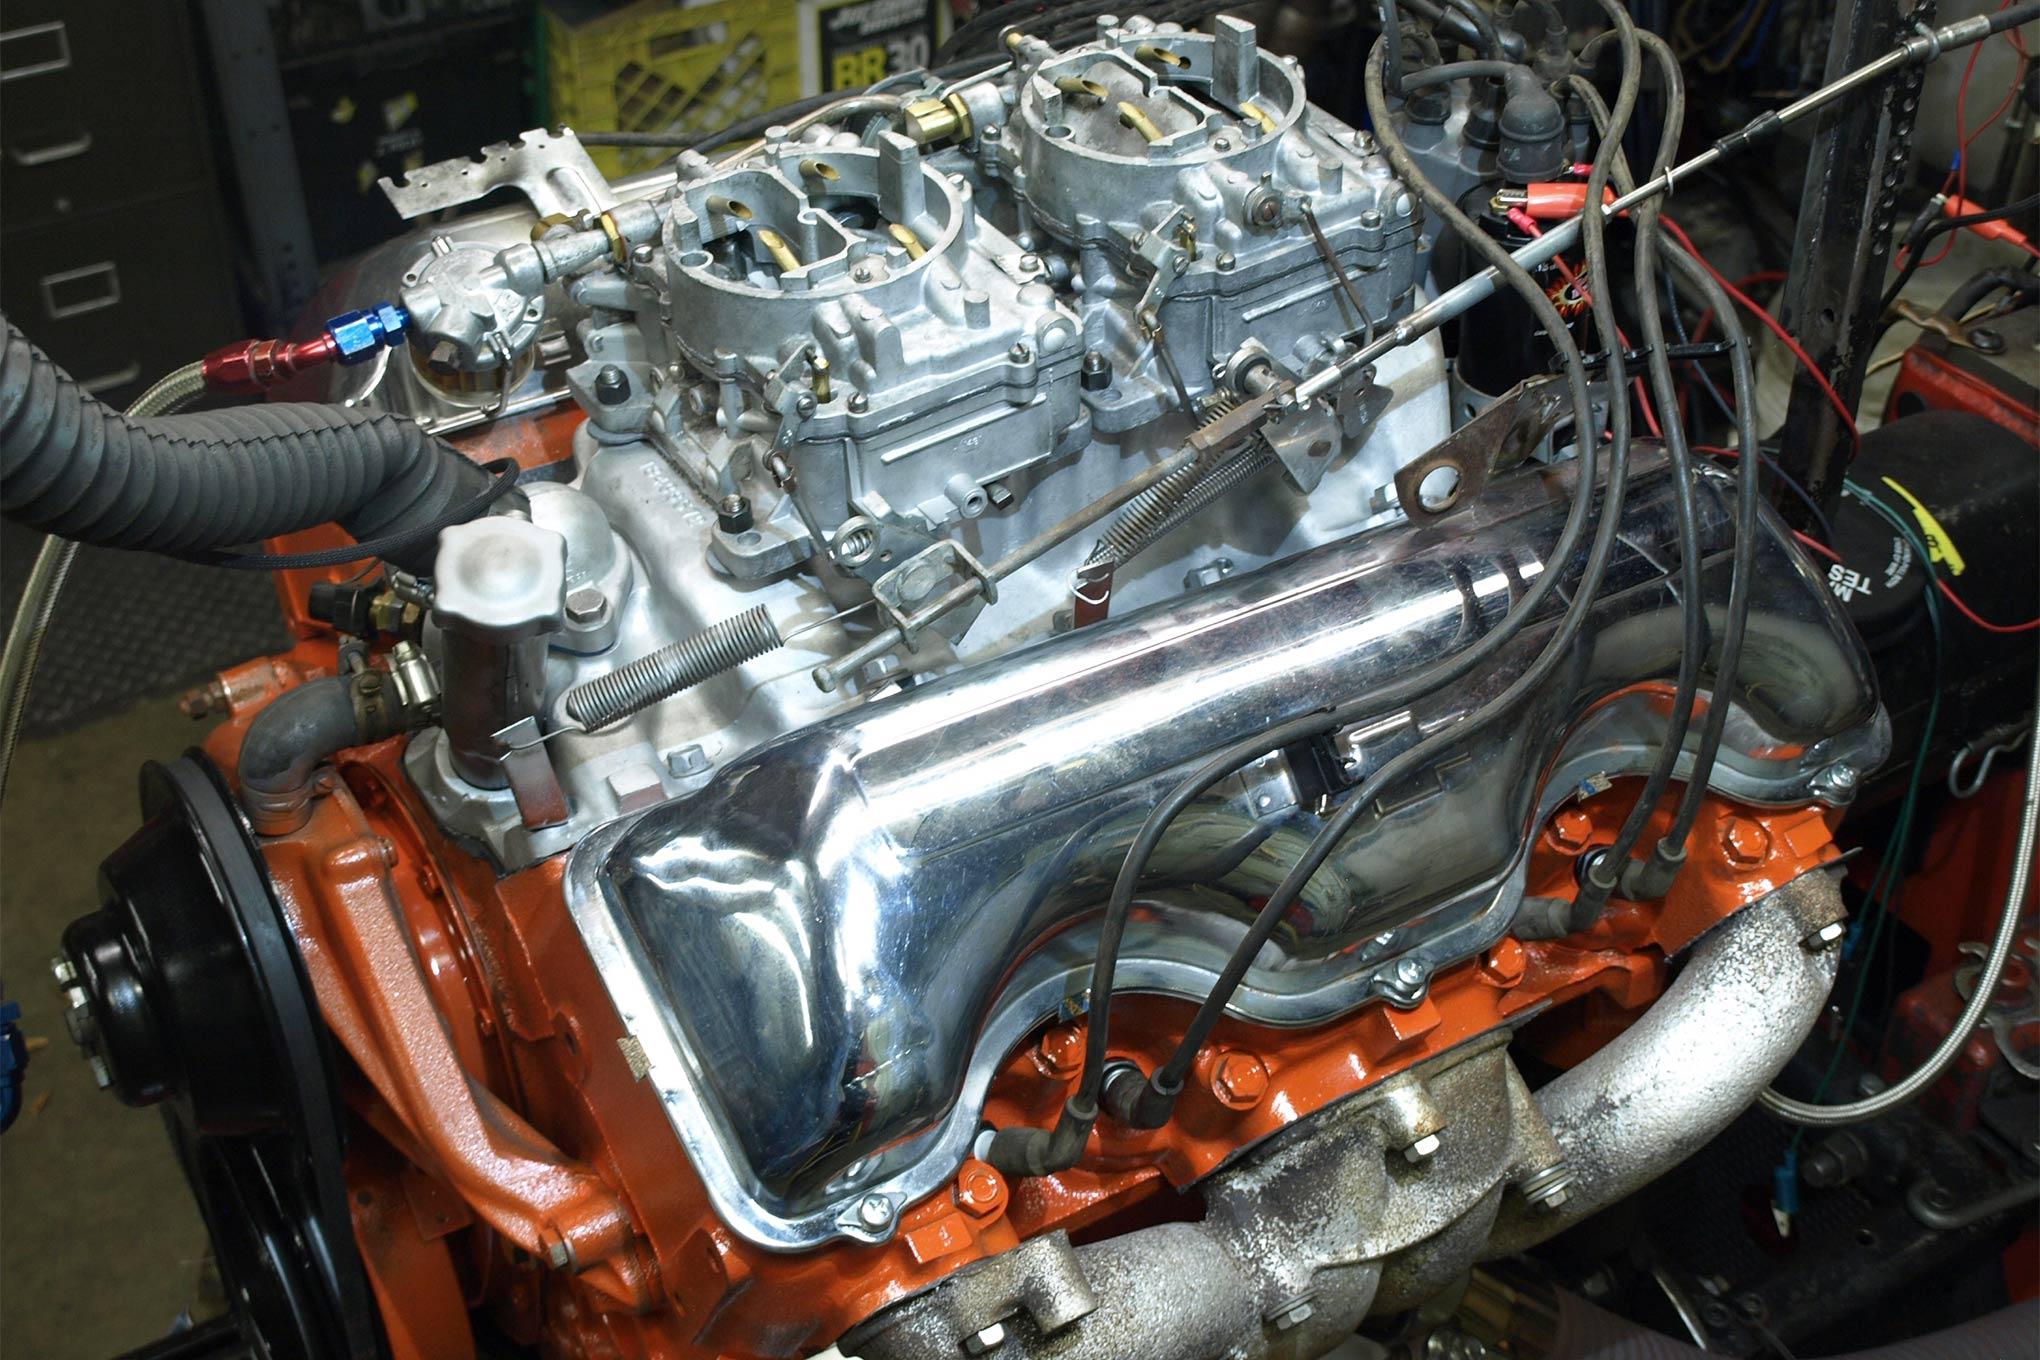 1976 Camaro Wiring Diagram Rebuilding Chevrolet S So Fine 409 V8 Engine Hot Rod Network